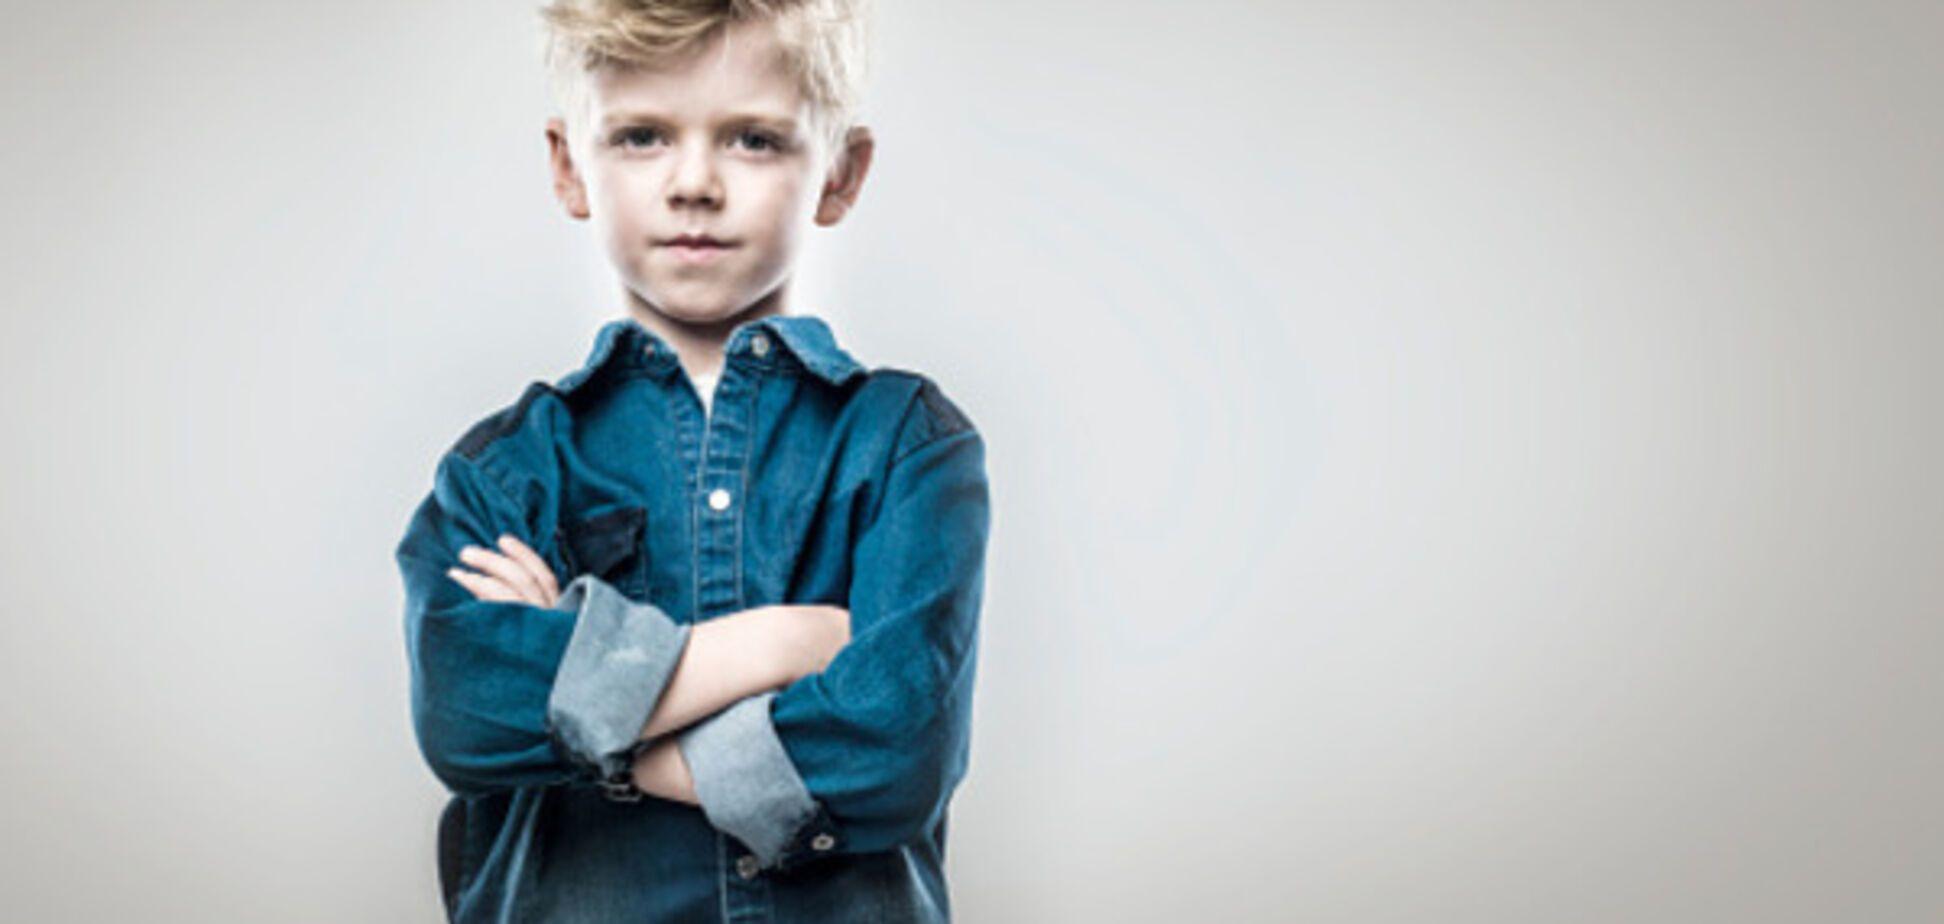 Навчити дитину захистити себе: опубліковано 6 правил